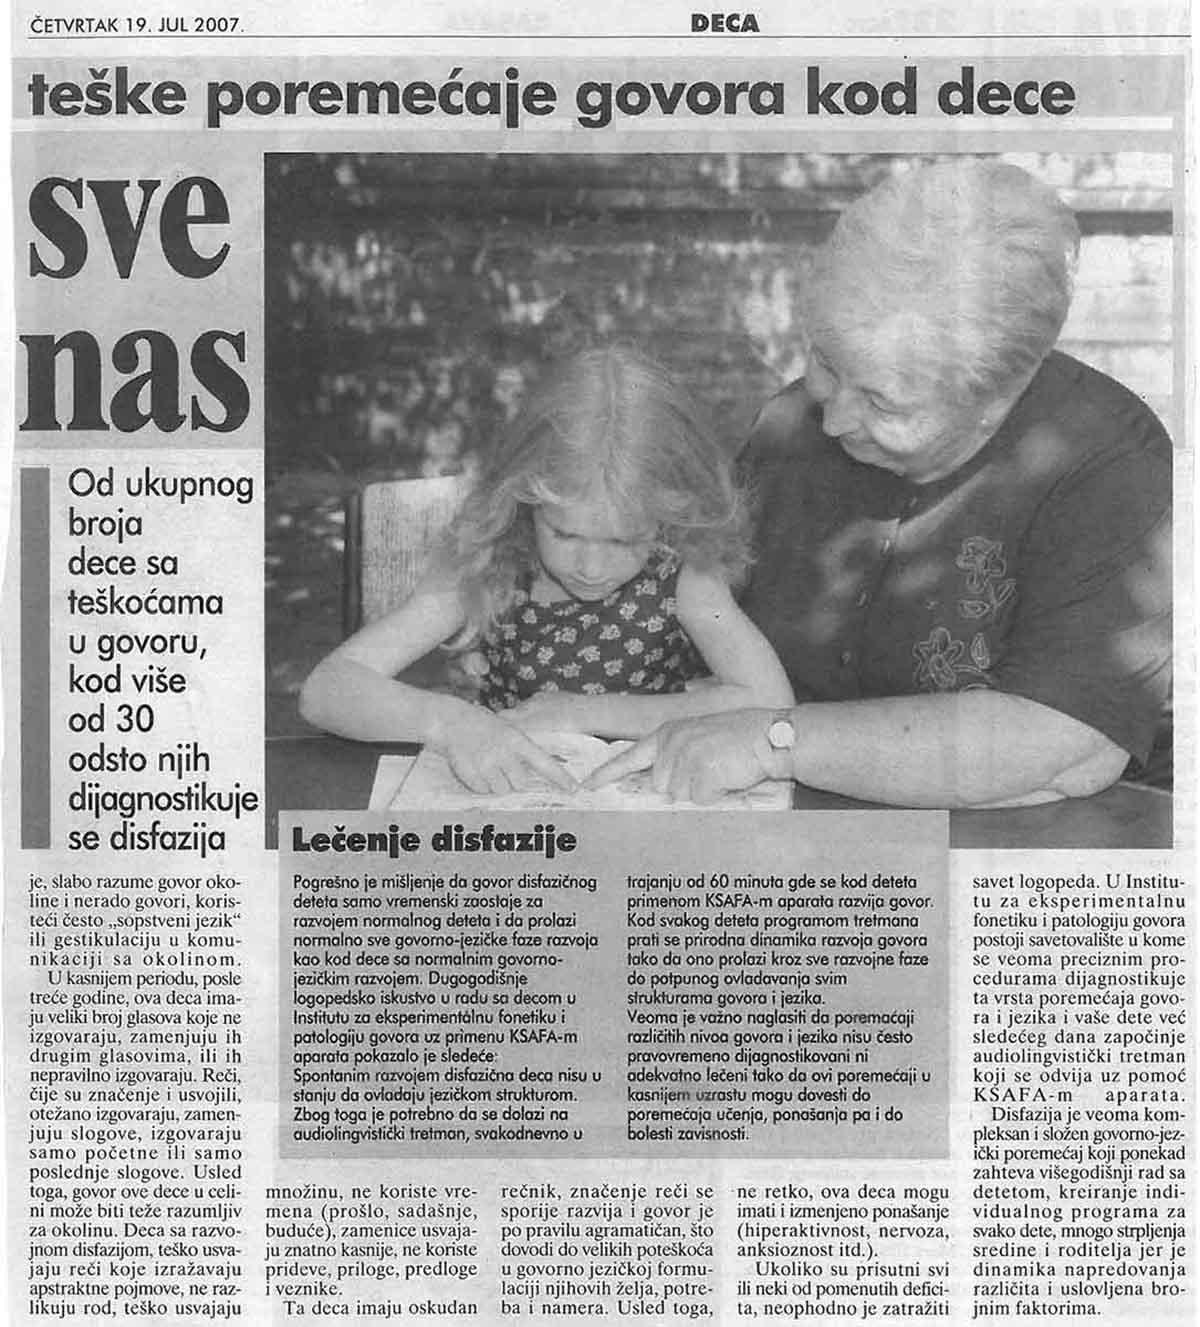 Disfazija sve češća – Blic 19.07.2007